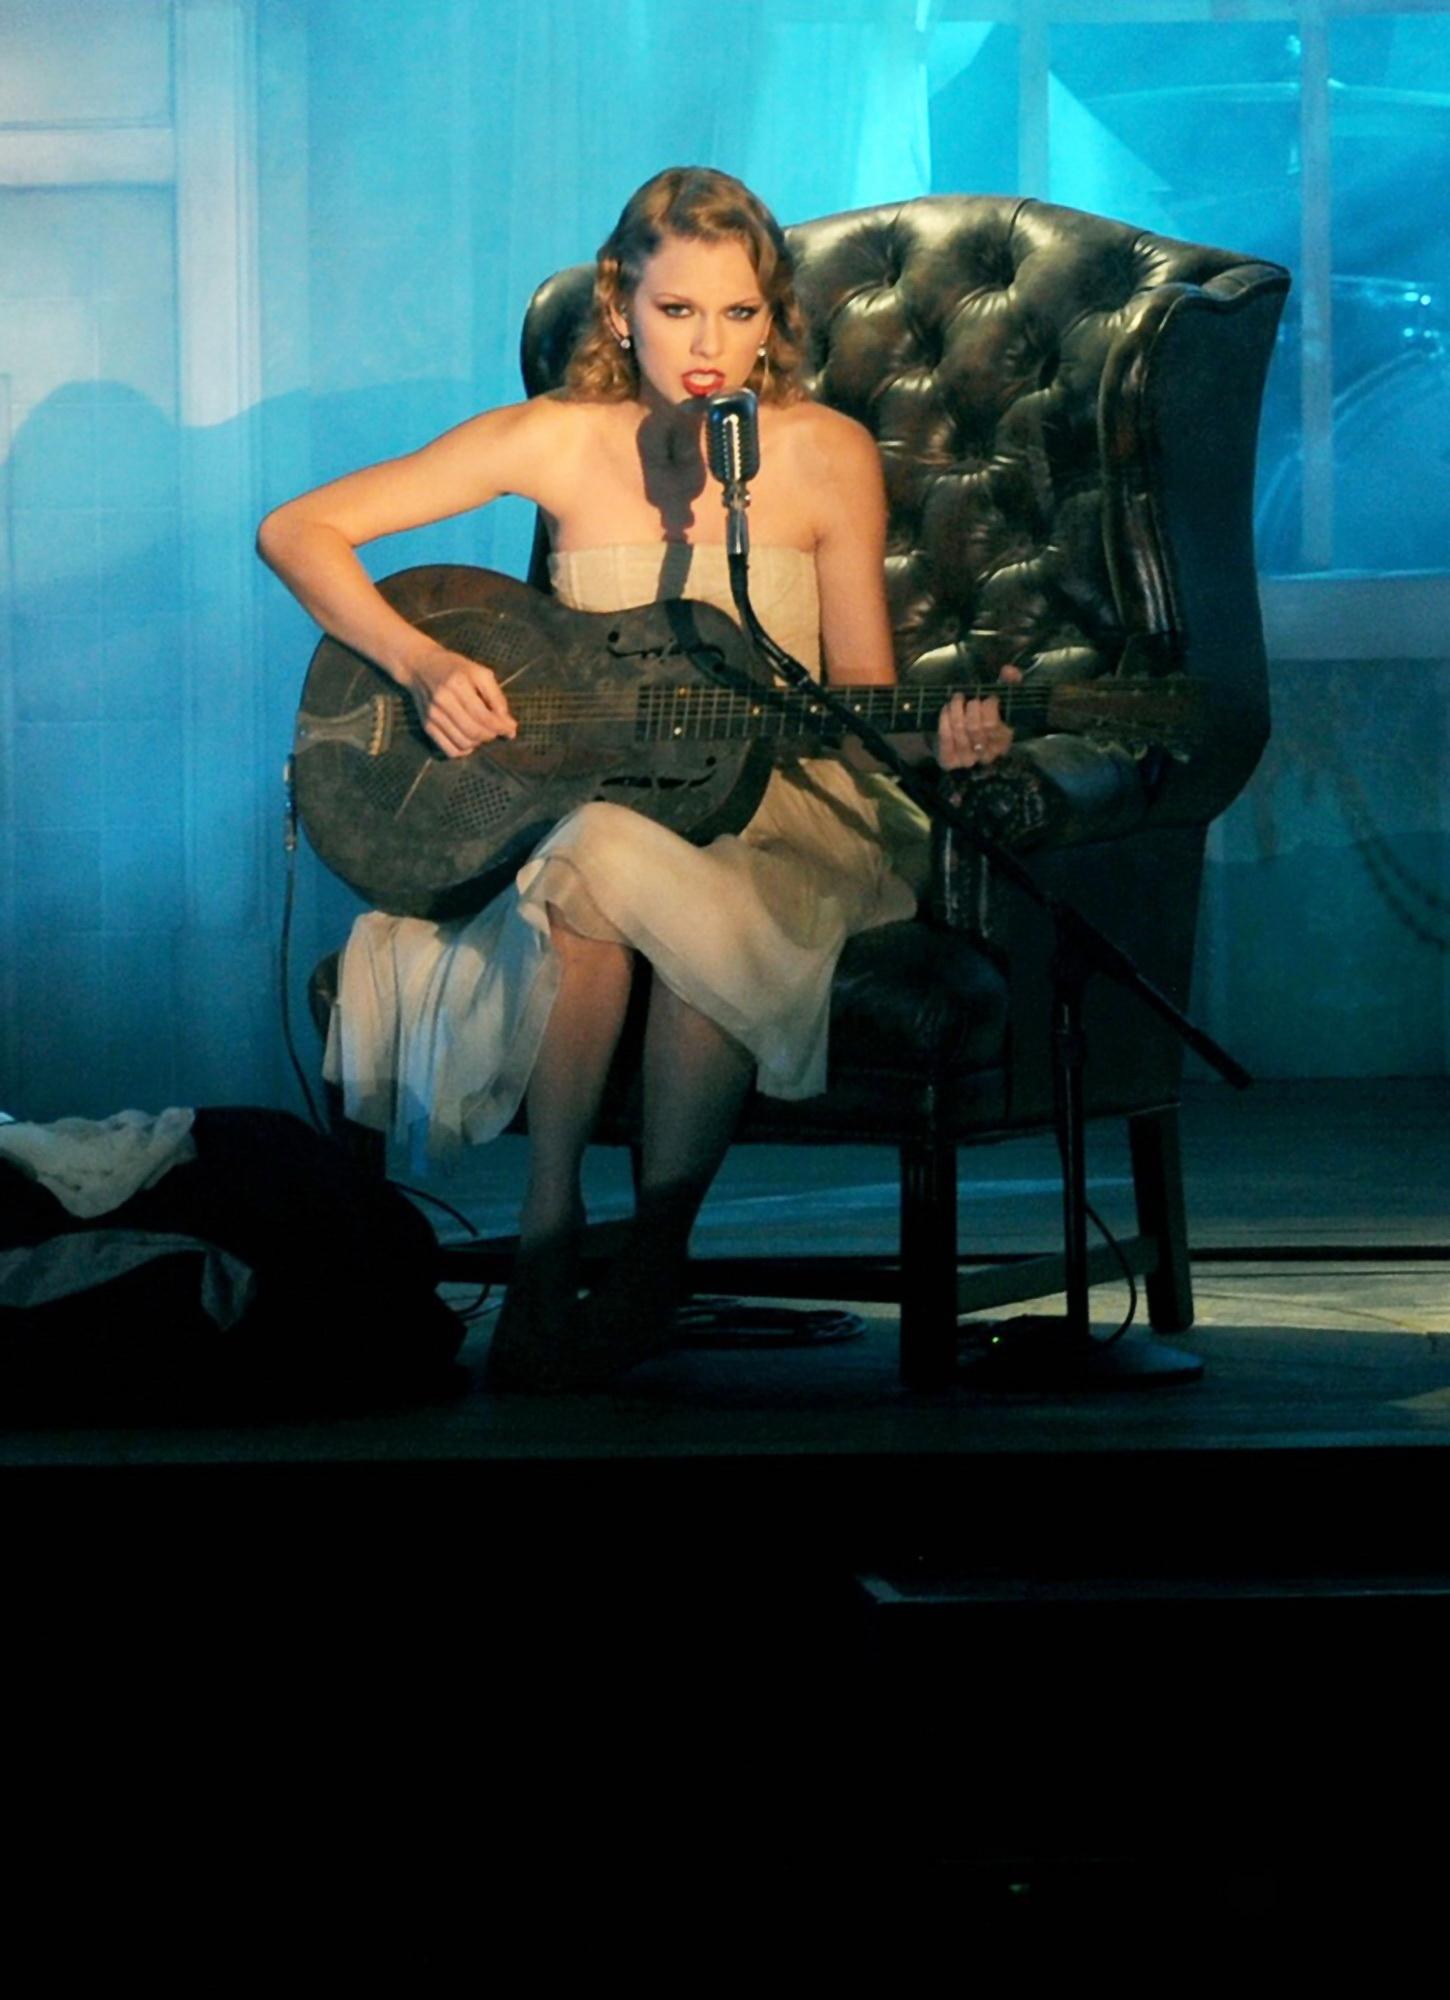 84900_Taylor_Swift_performs_at_2010_MTV_Video_Music_Awards10_122_137lo.jpg